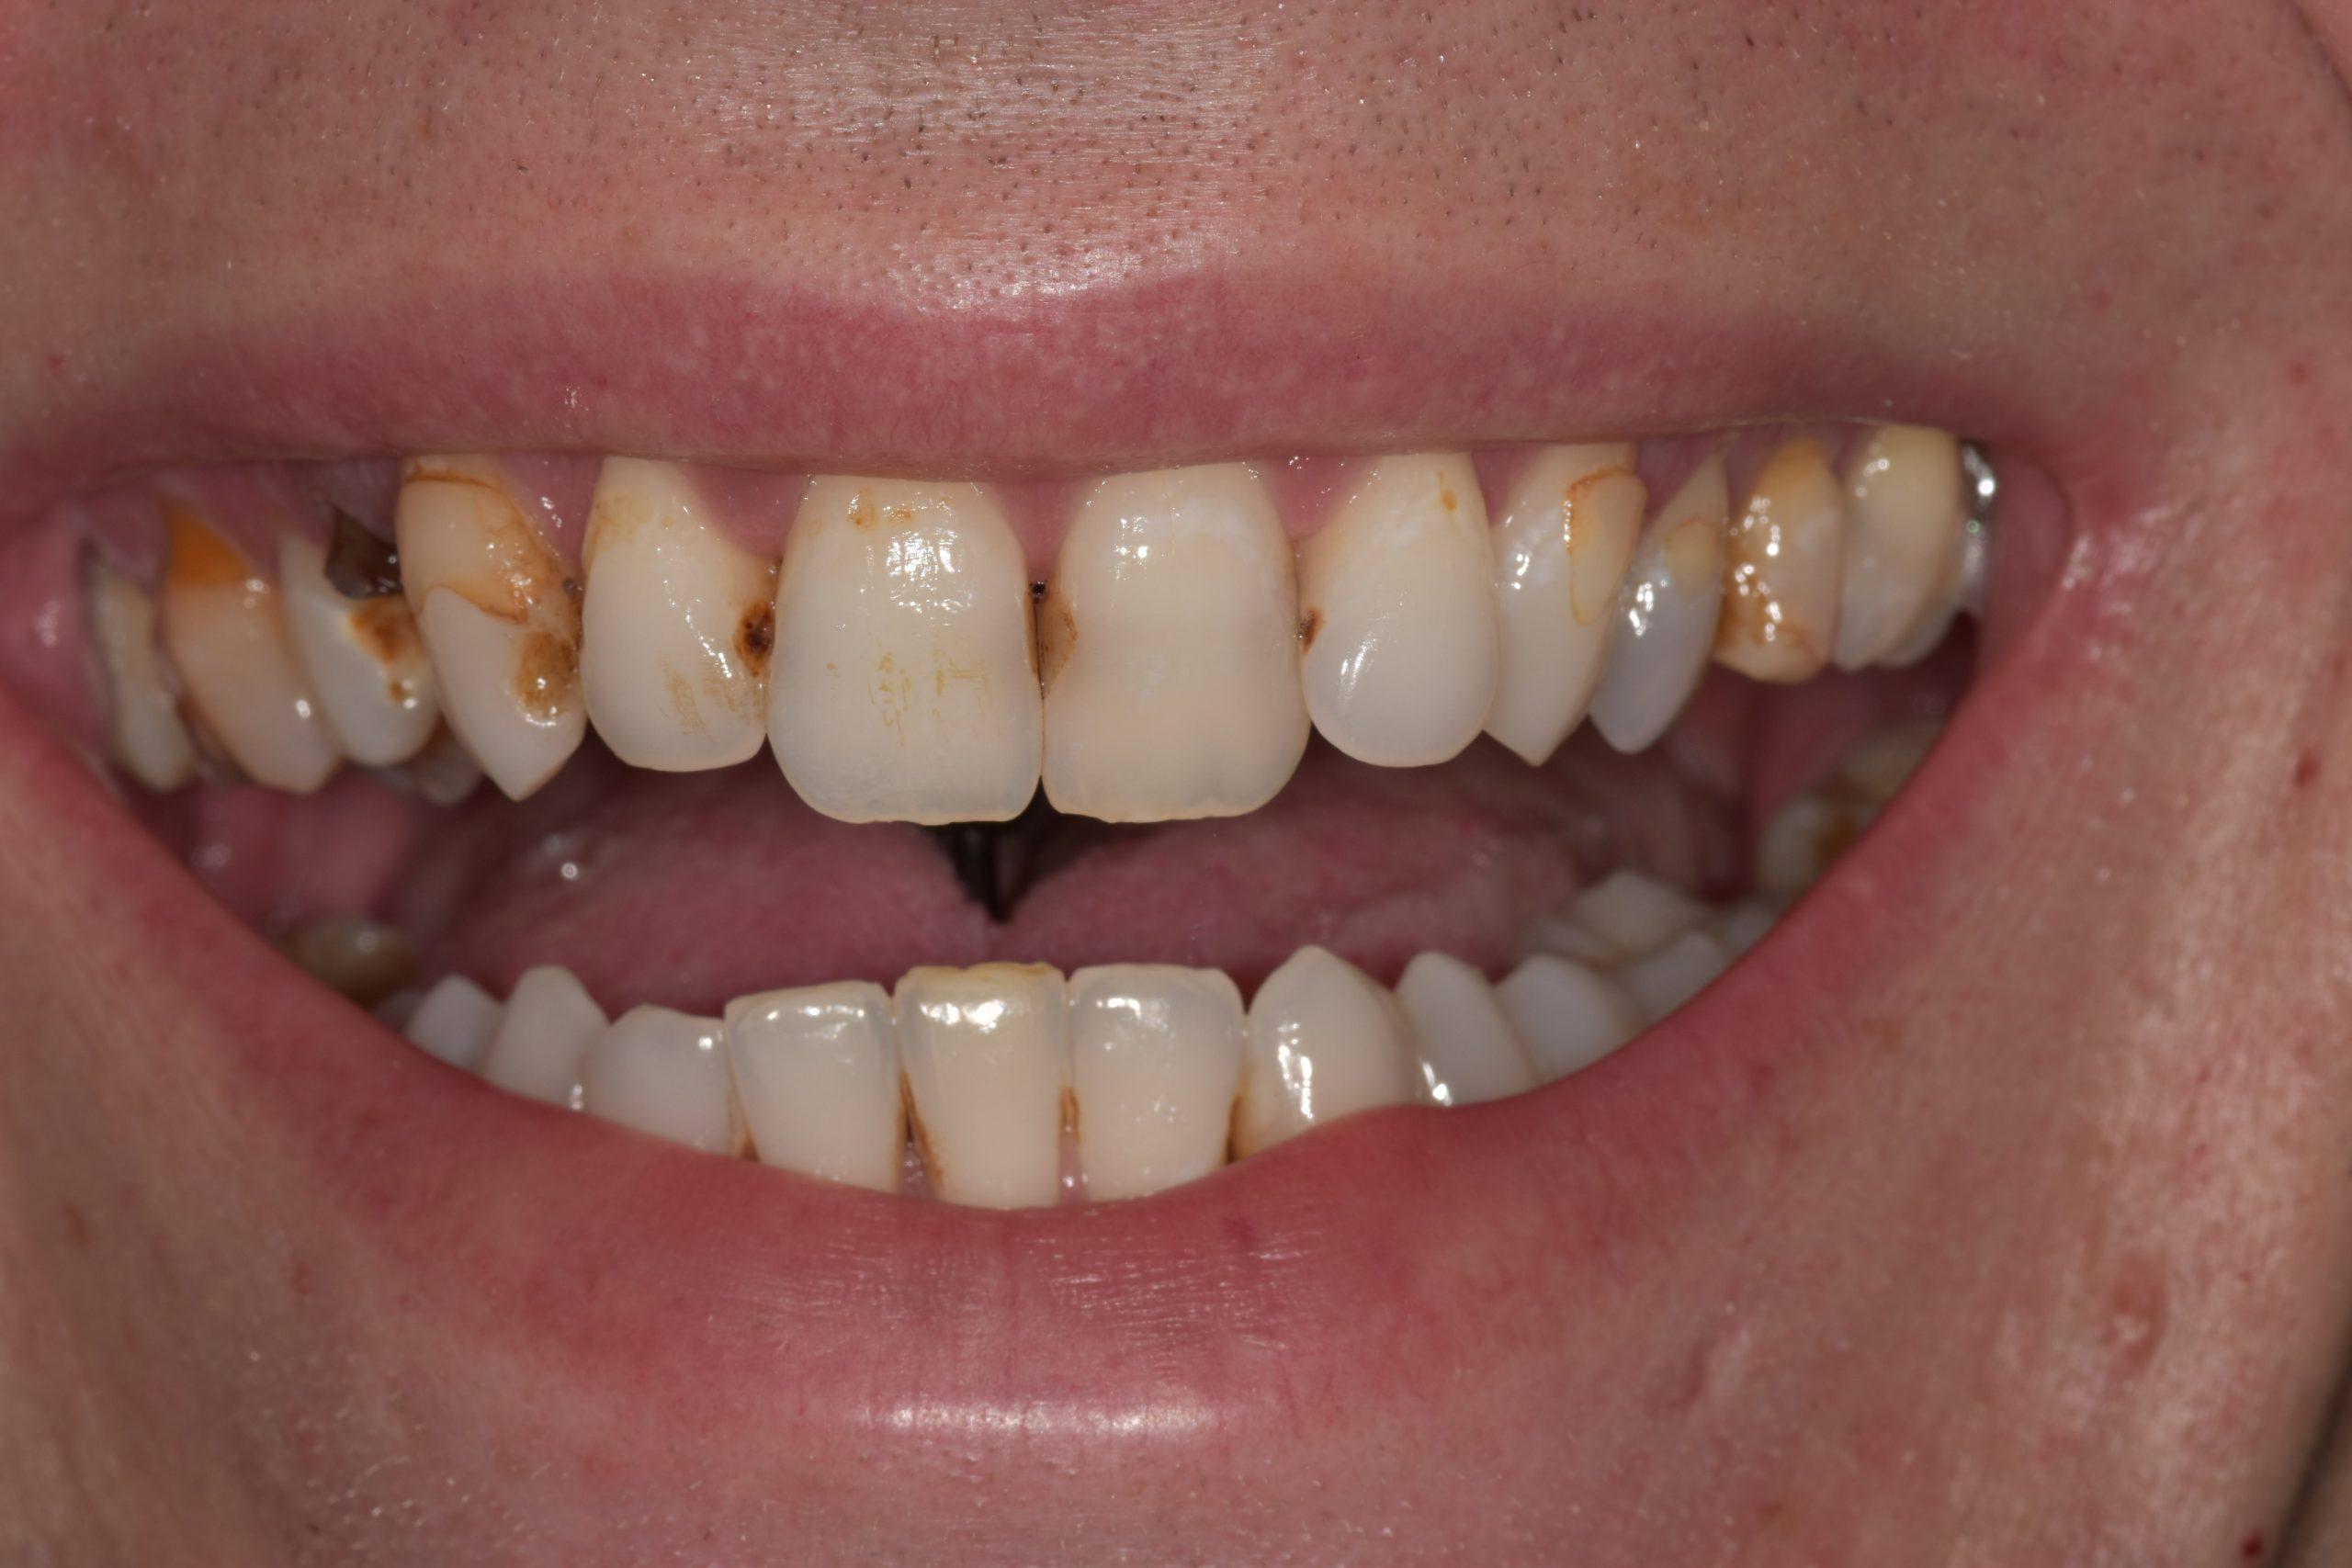 lichfield teeth whitening treatment